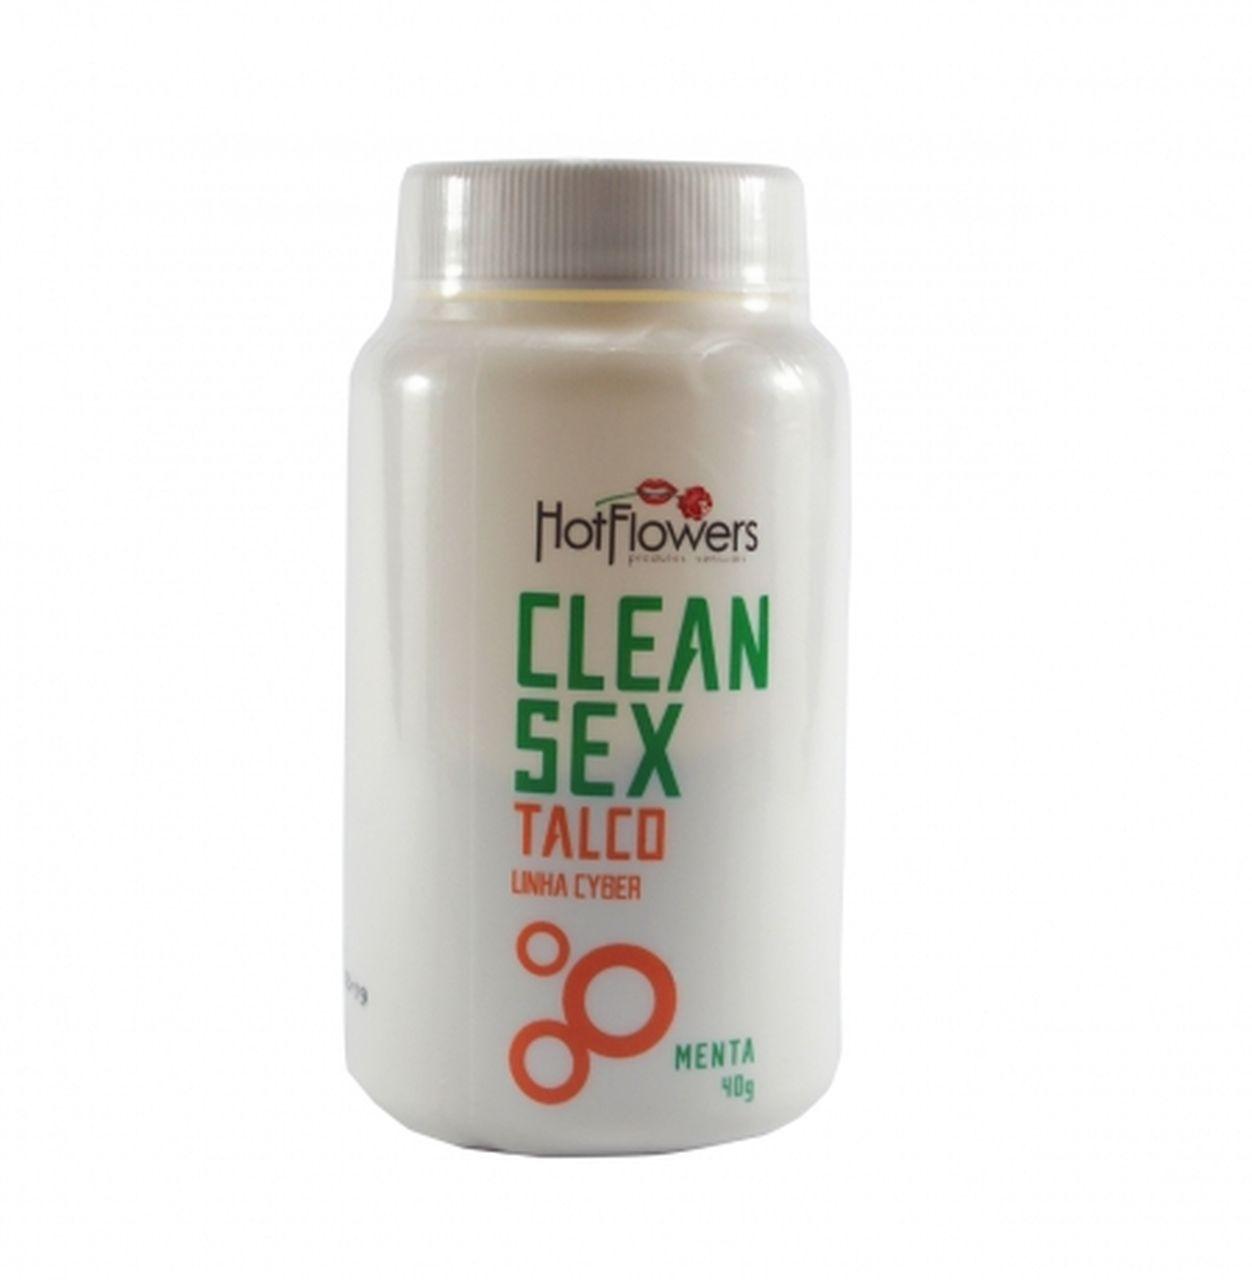 TALCO CLEAN SEX PARA BRINQUEDOS ERÓTICOS